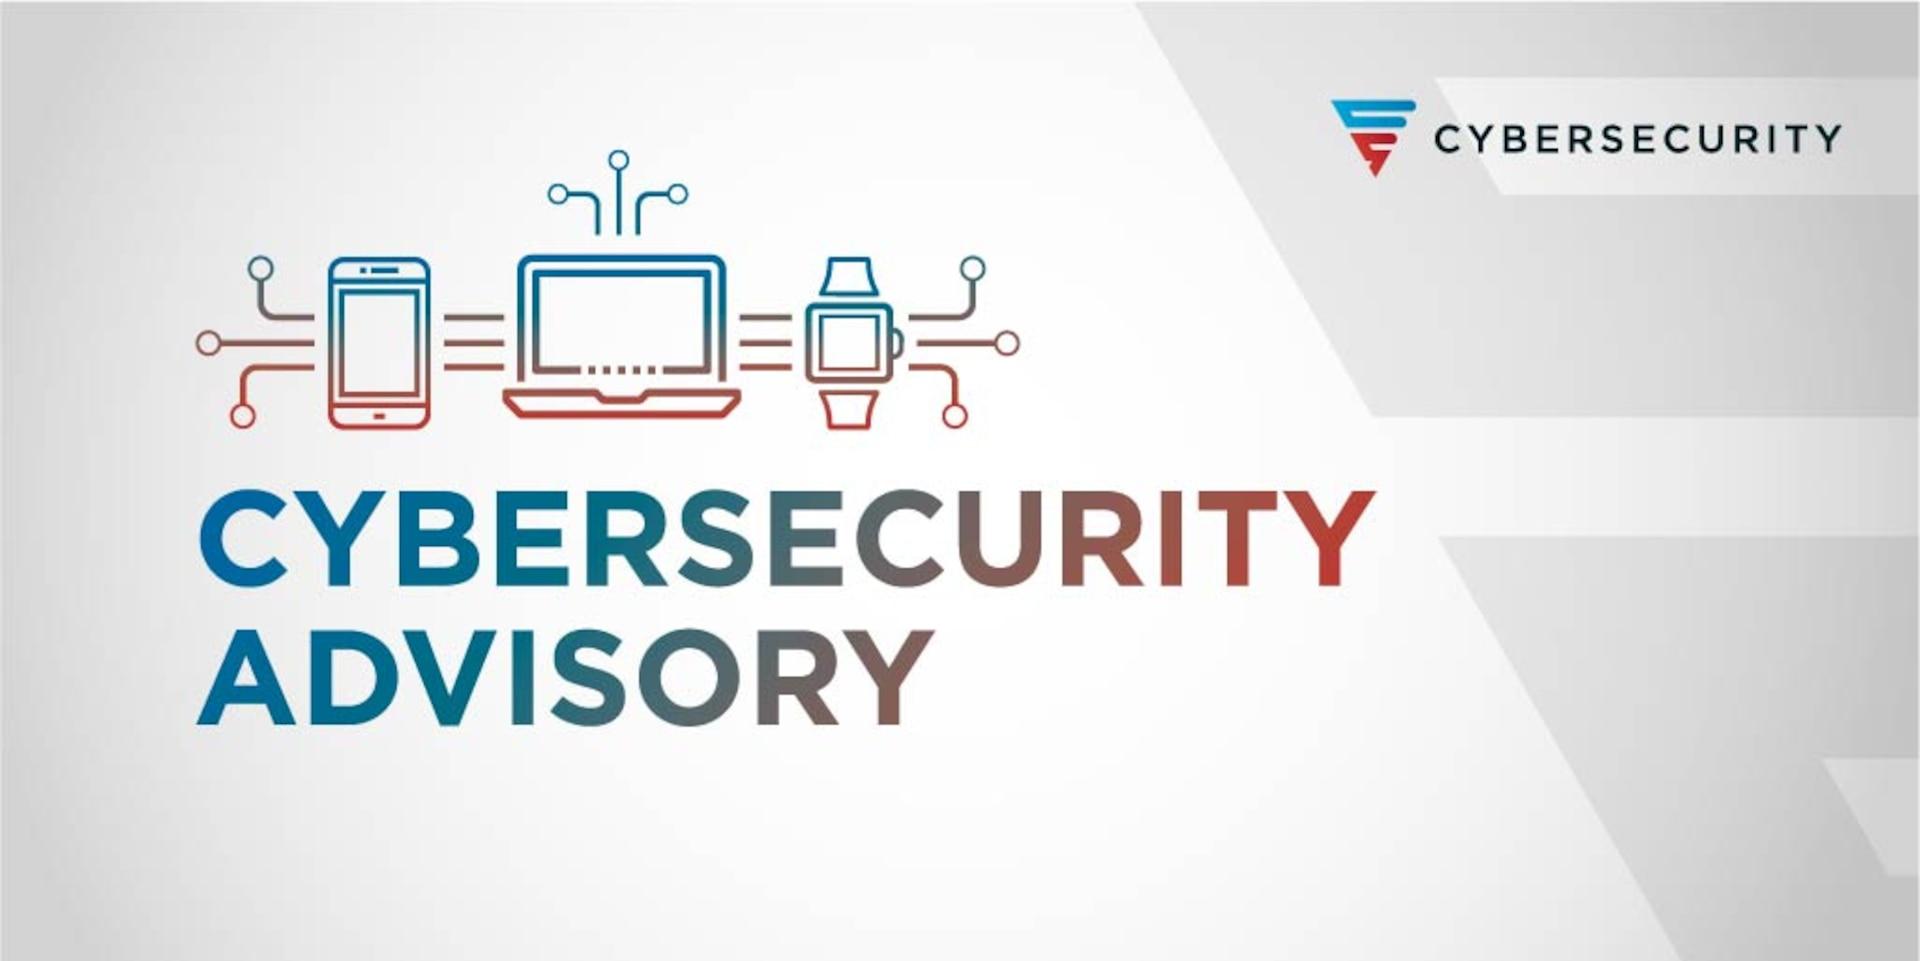 Cybersecurity Advisory